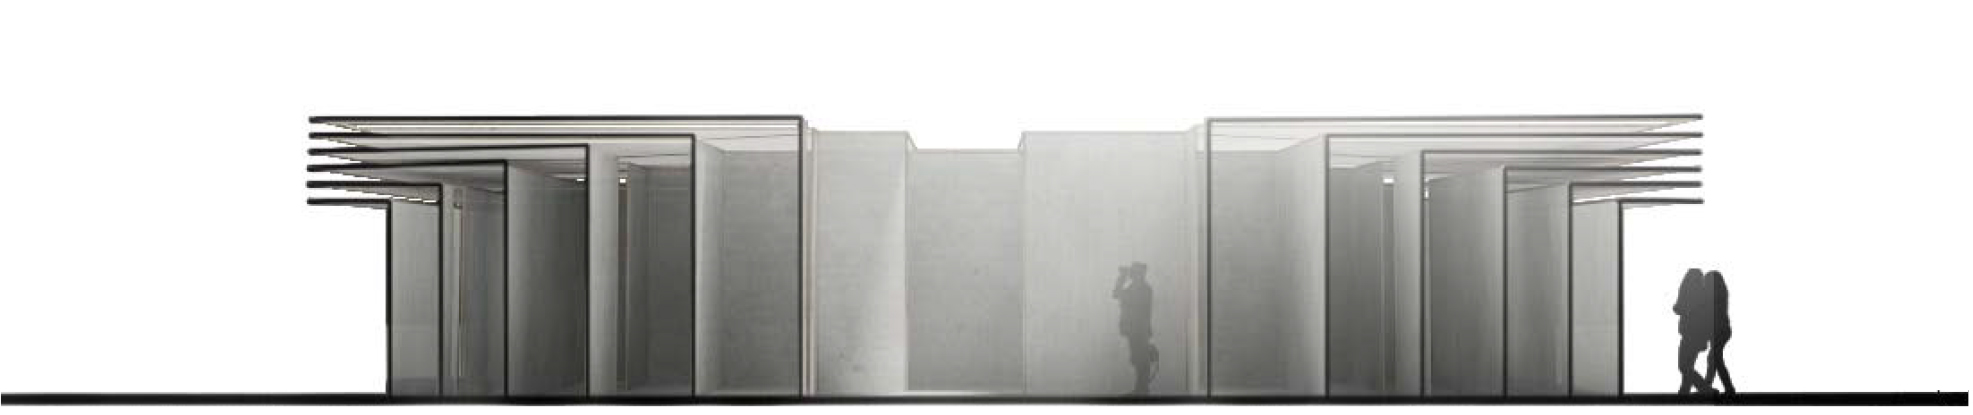 Impeccably designed by Bastian Feltgen